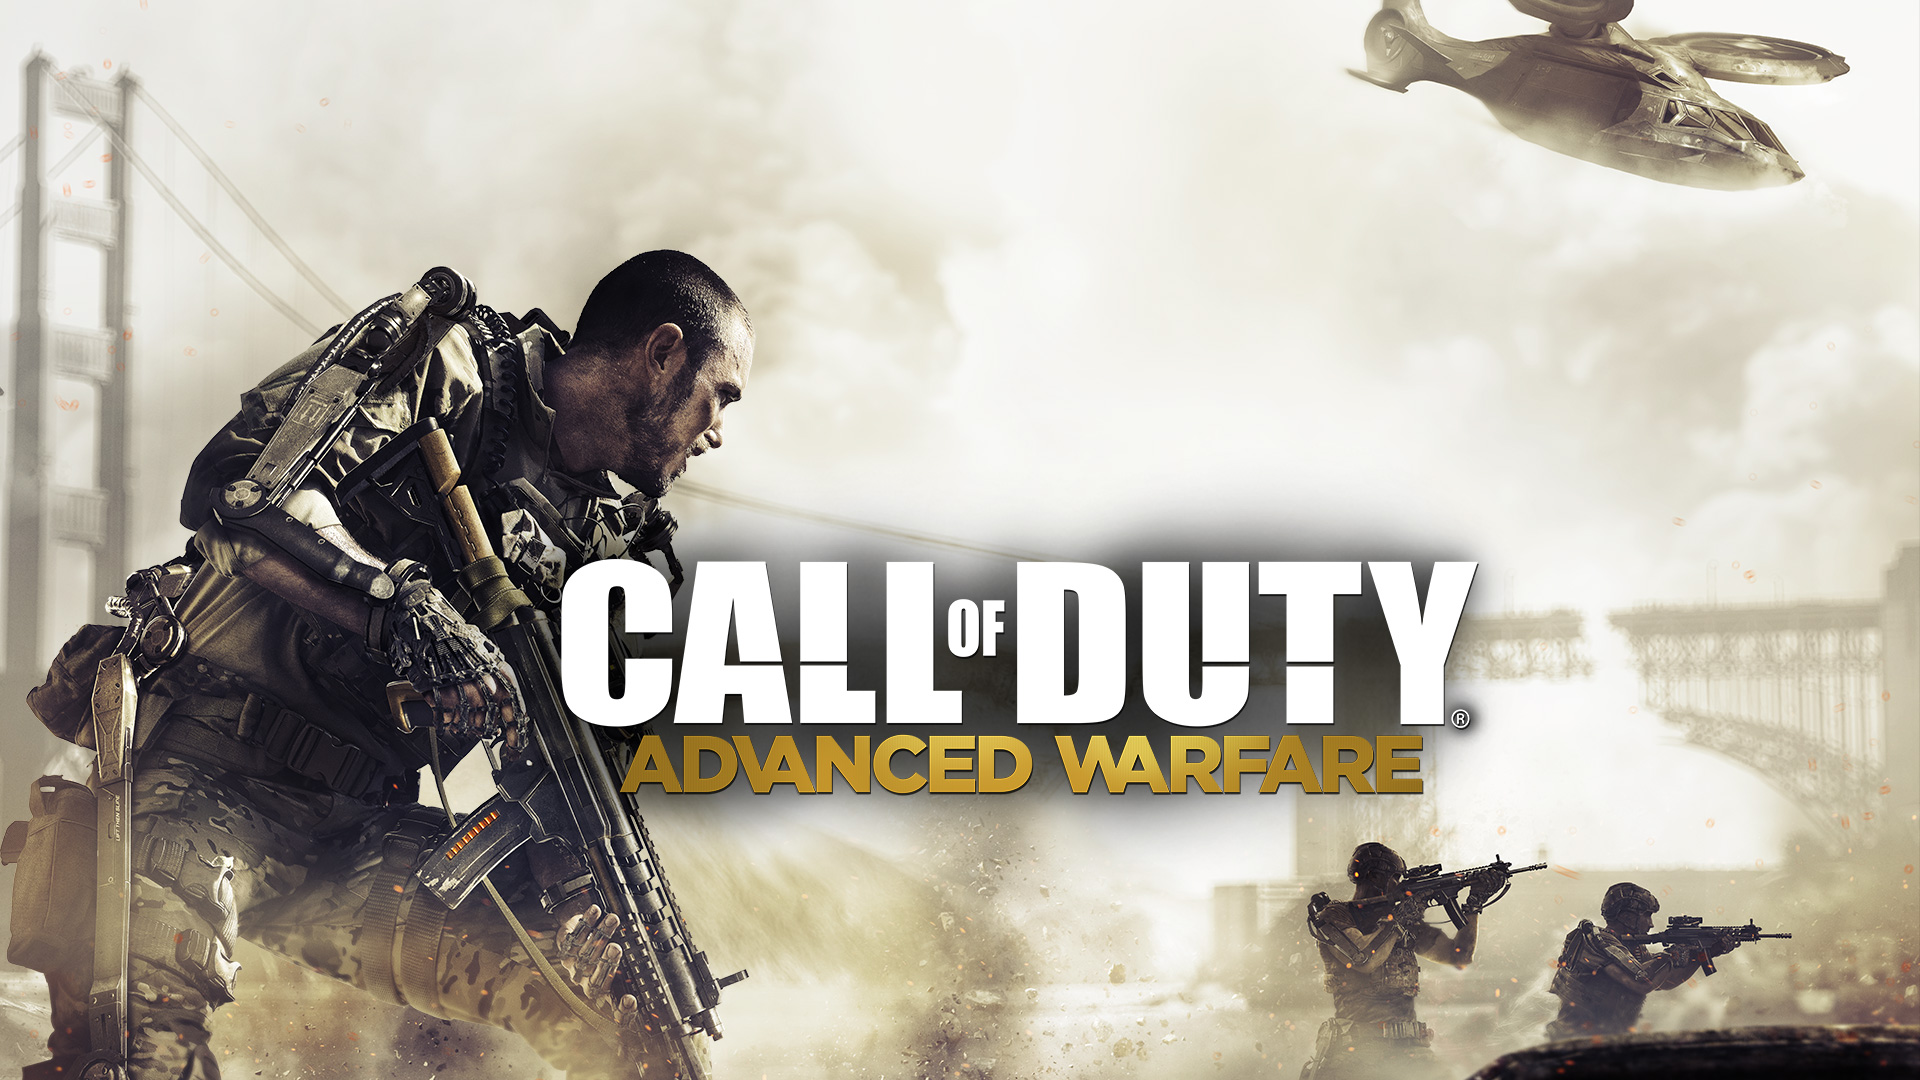 call-of-duty-advanced-warfare-listing-thumb-01-us-05may14